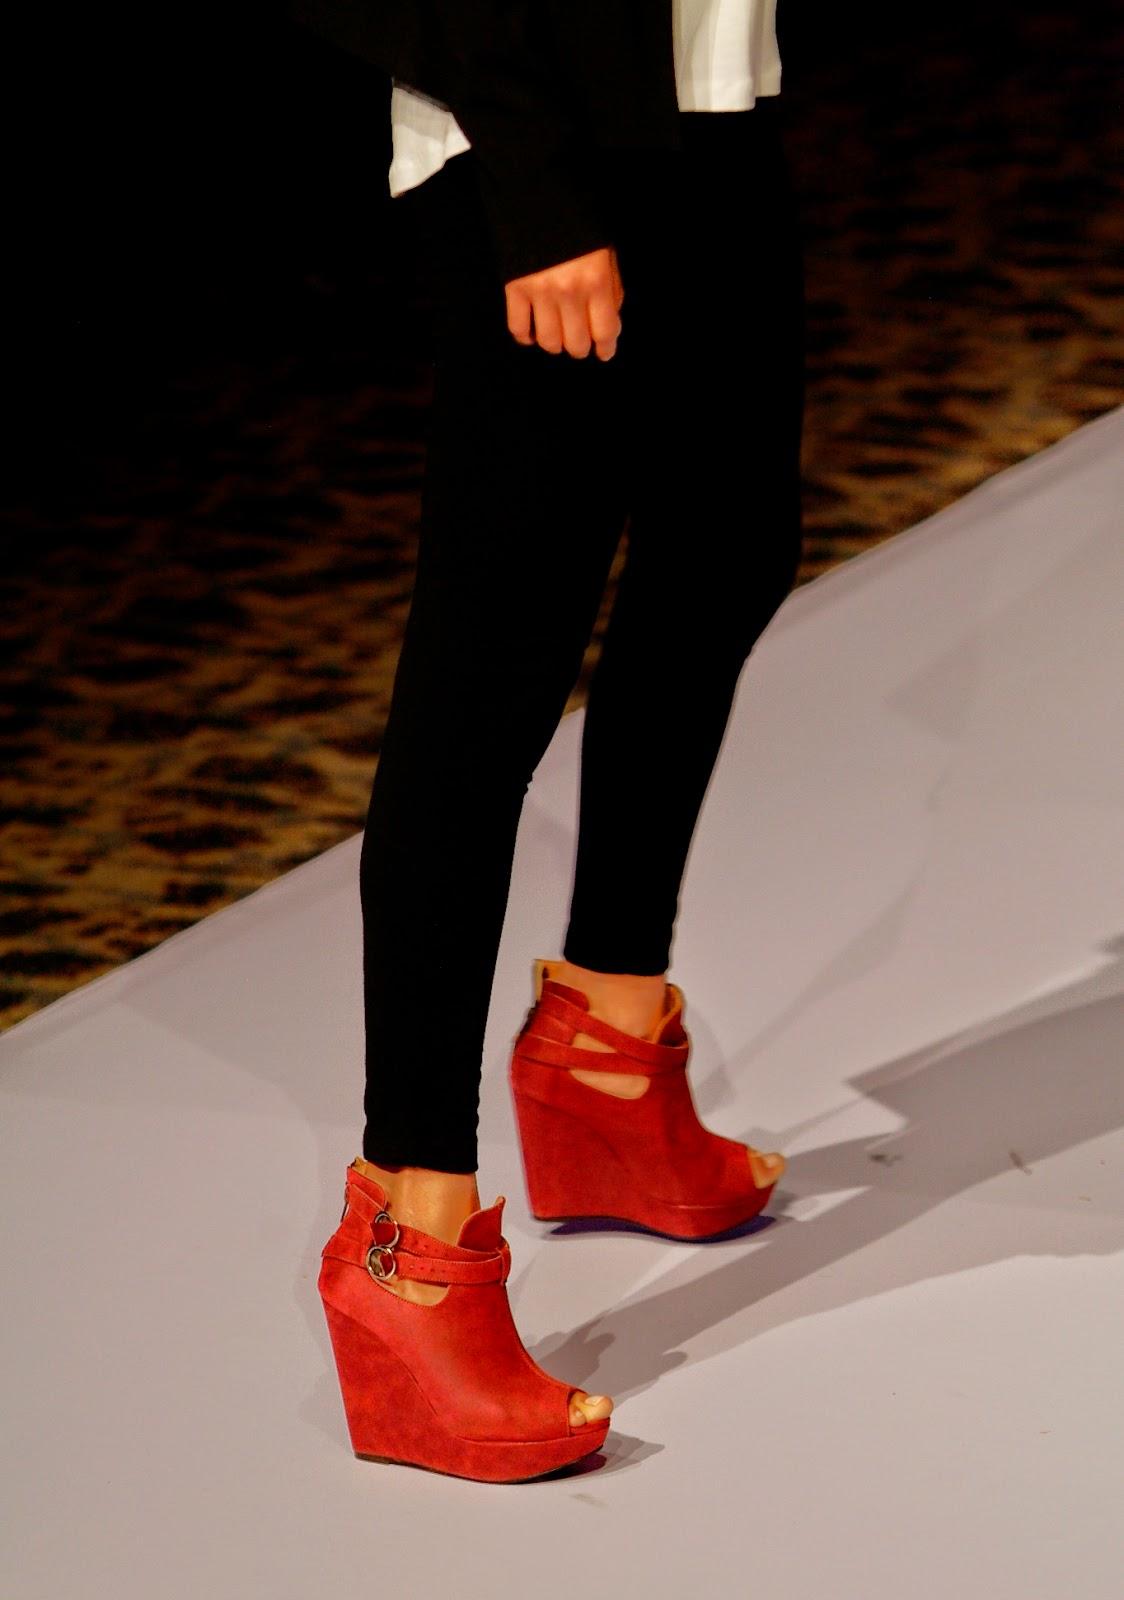 pasarela, lady paulina, calzado dama, calzado mujer, zapatos mujer, calzado mexicano, sapica marzo 2014.